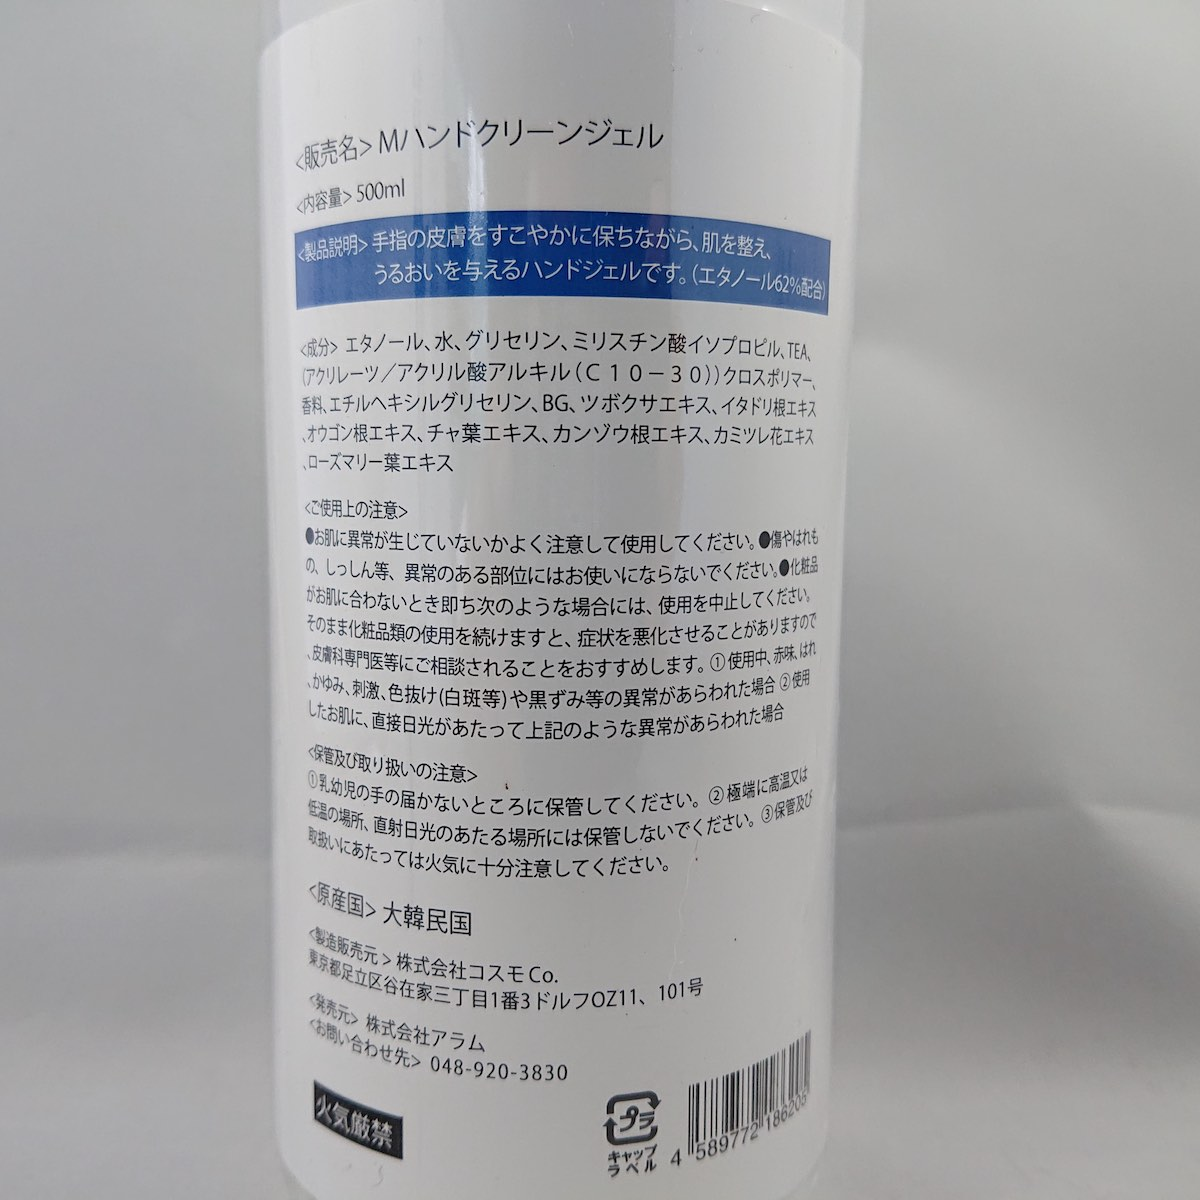 Dr.CPU エタノール62%配合ハンドジェル500ml (福島市内送料無料)